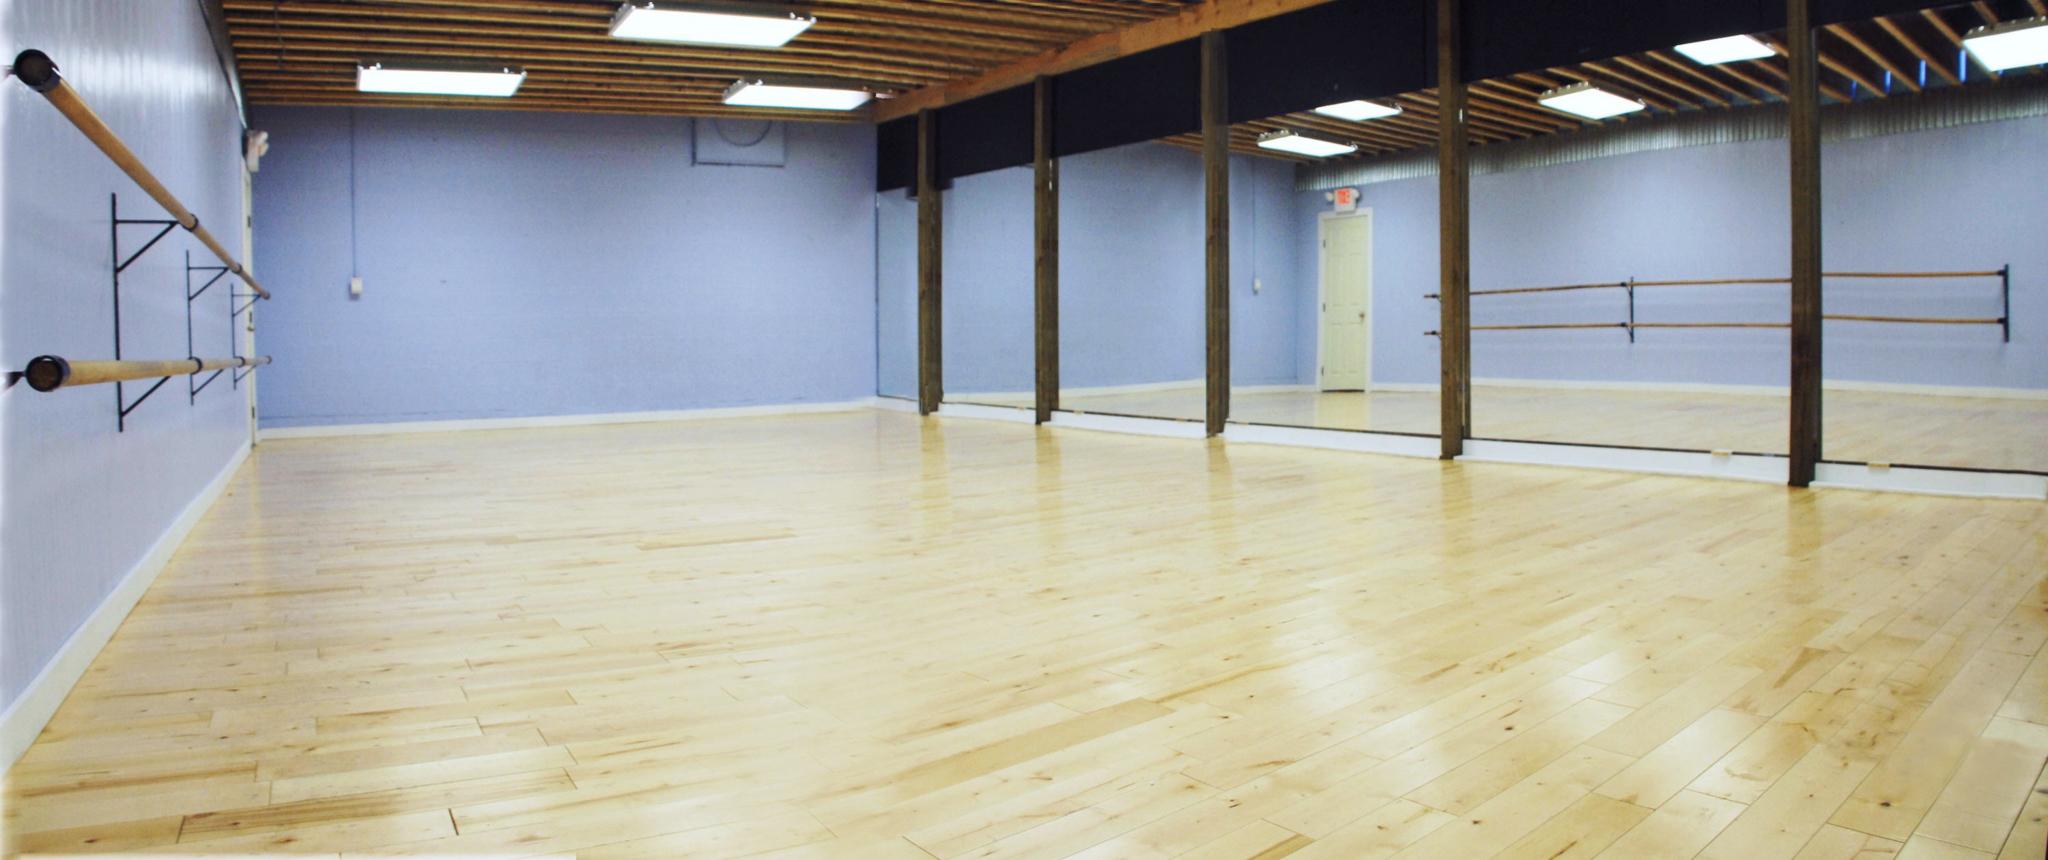 The Academy of Dance in Kamloops